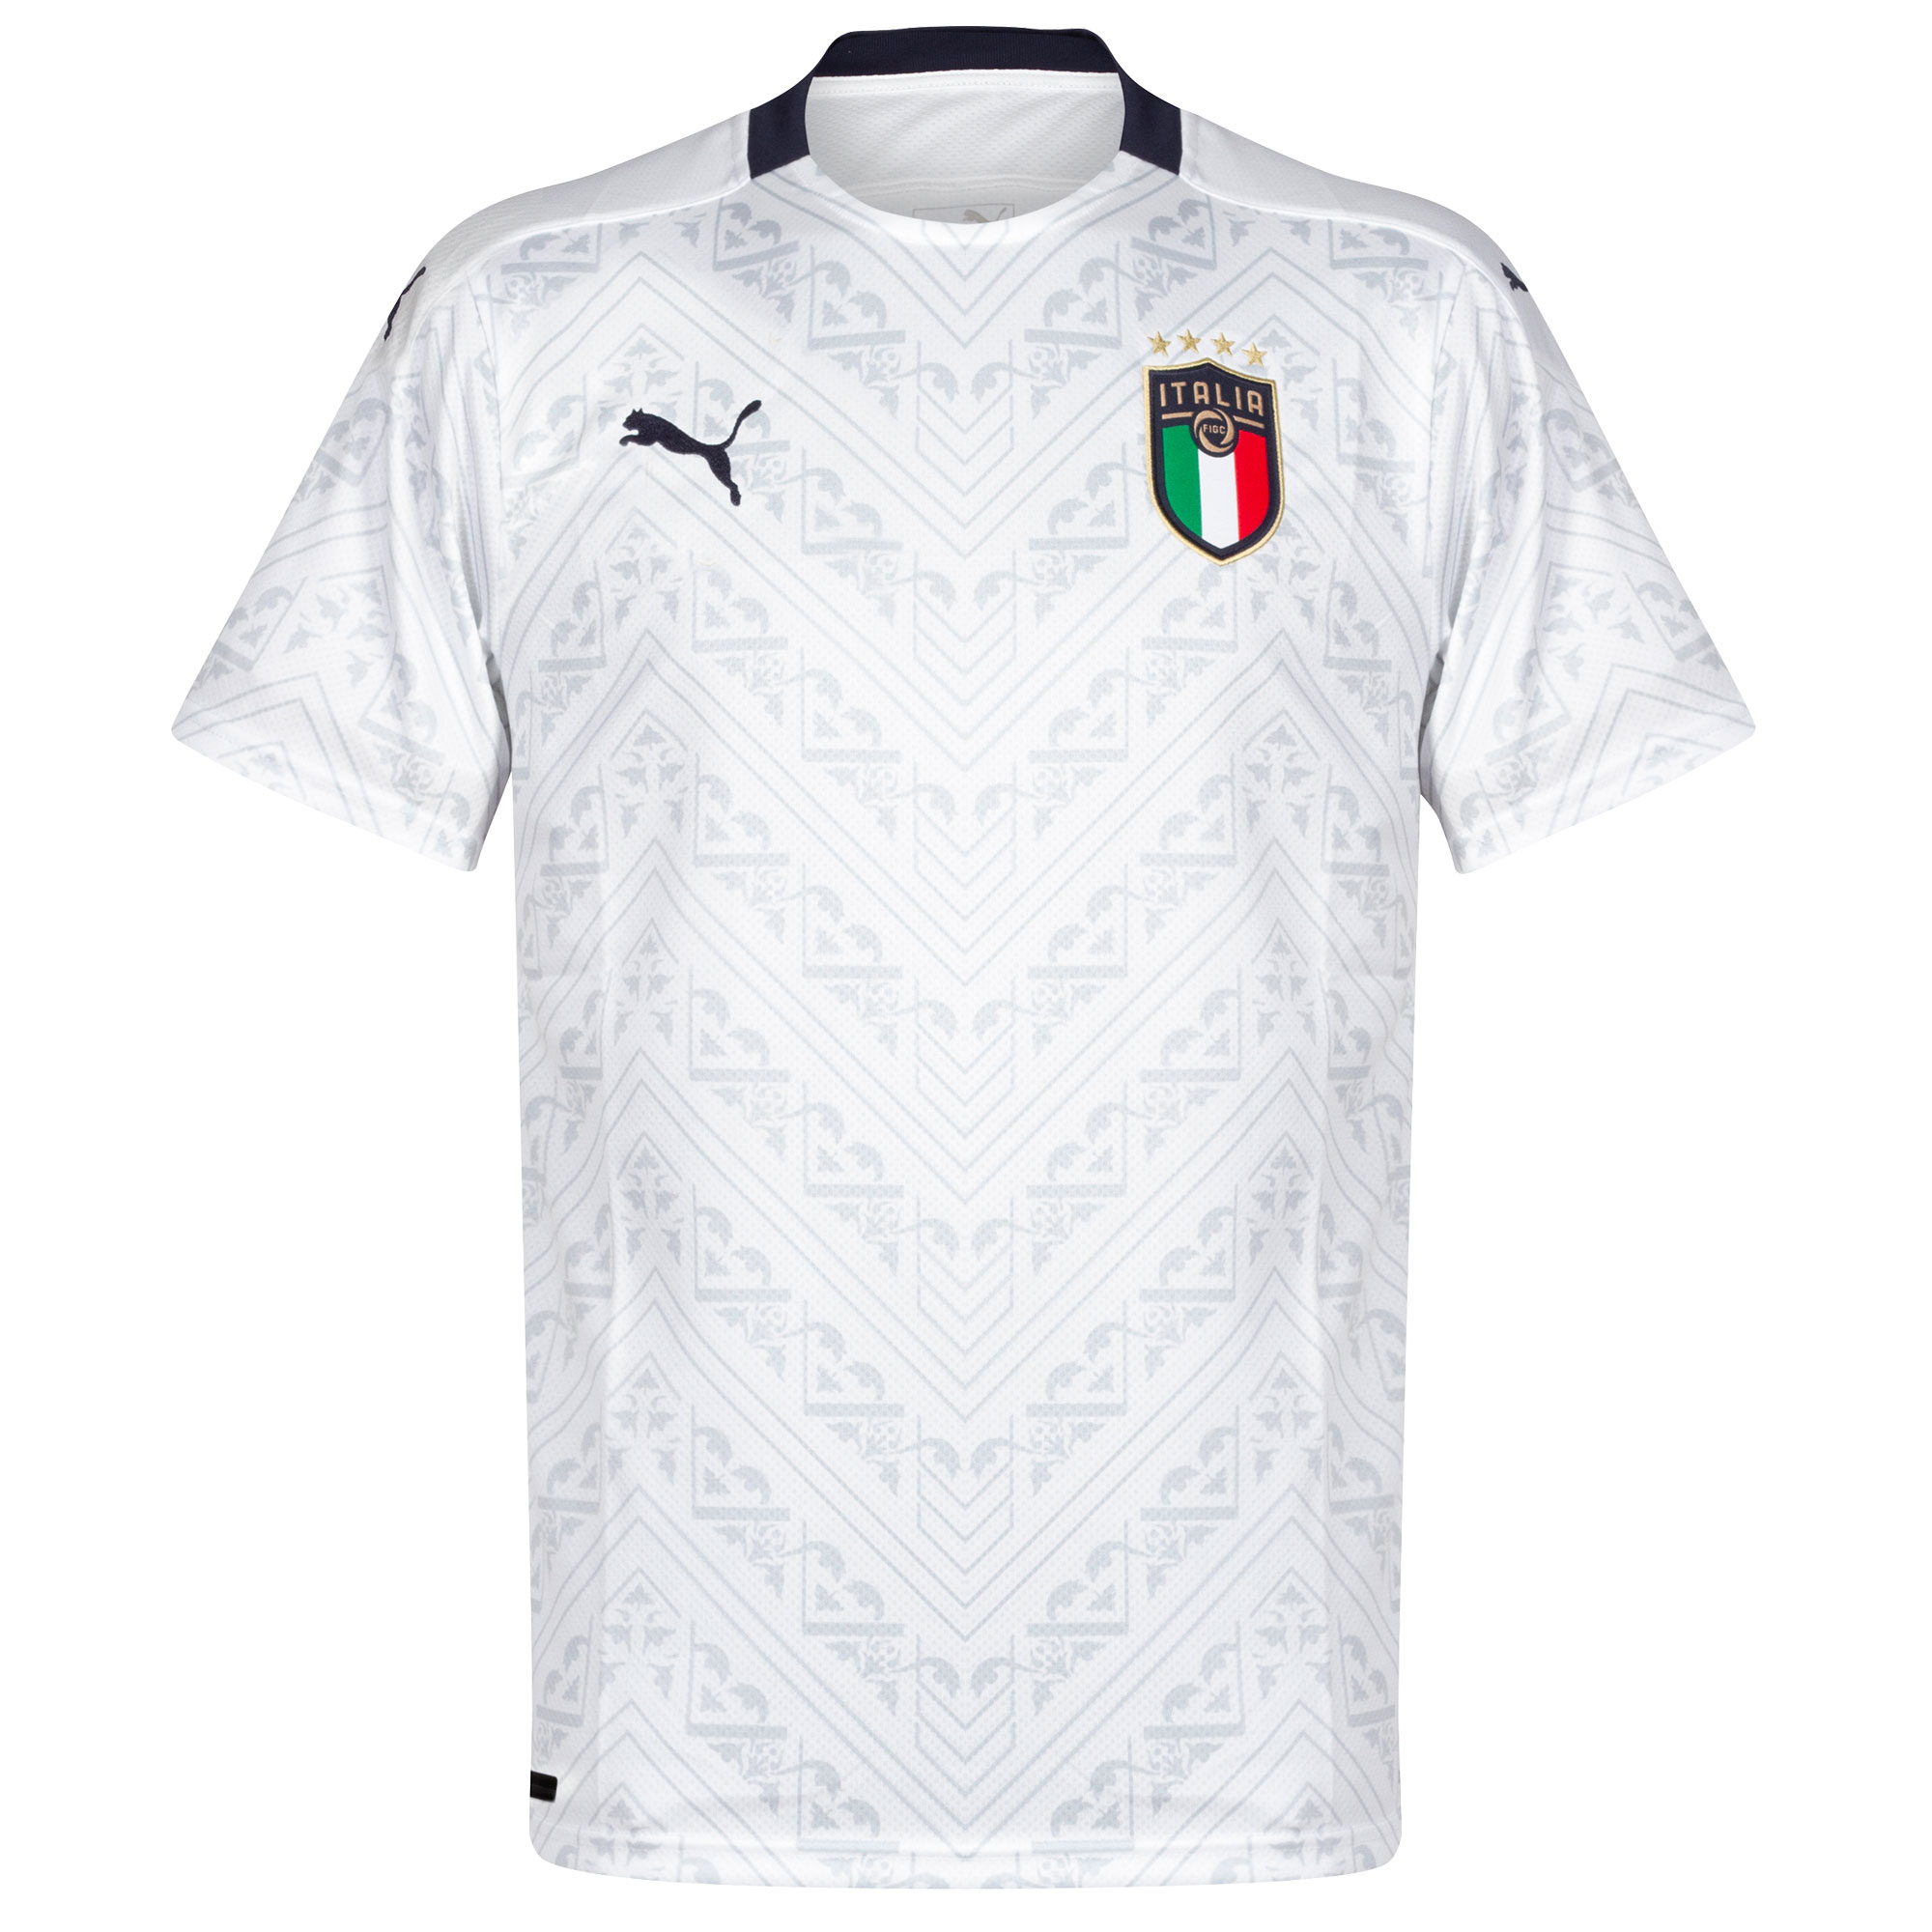 Puma Italy Away Shirt 2020-2021